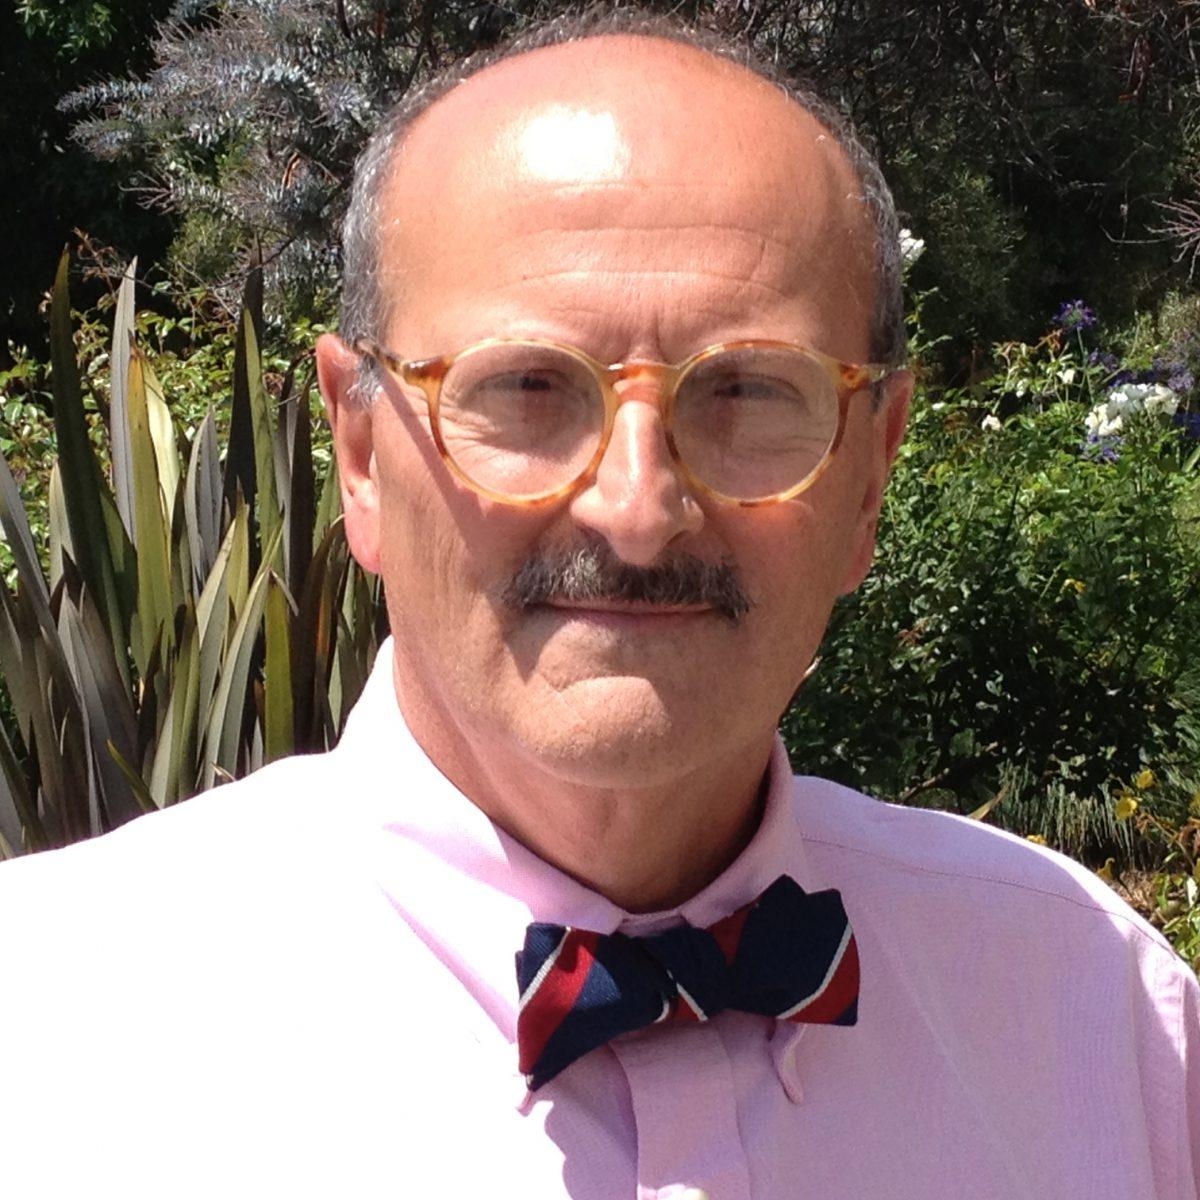 Joseph Purpura, MD, '80 GME, '09 MS